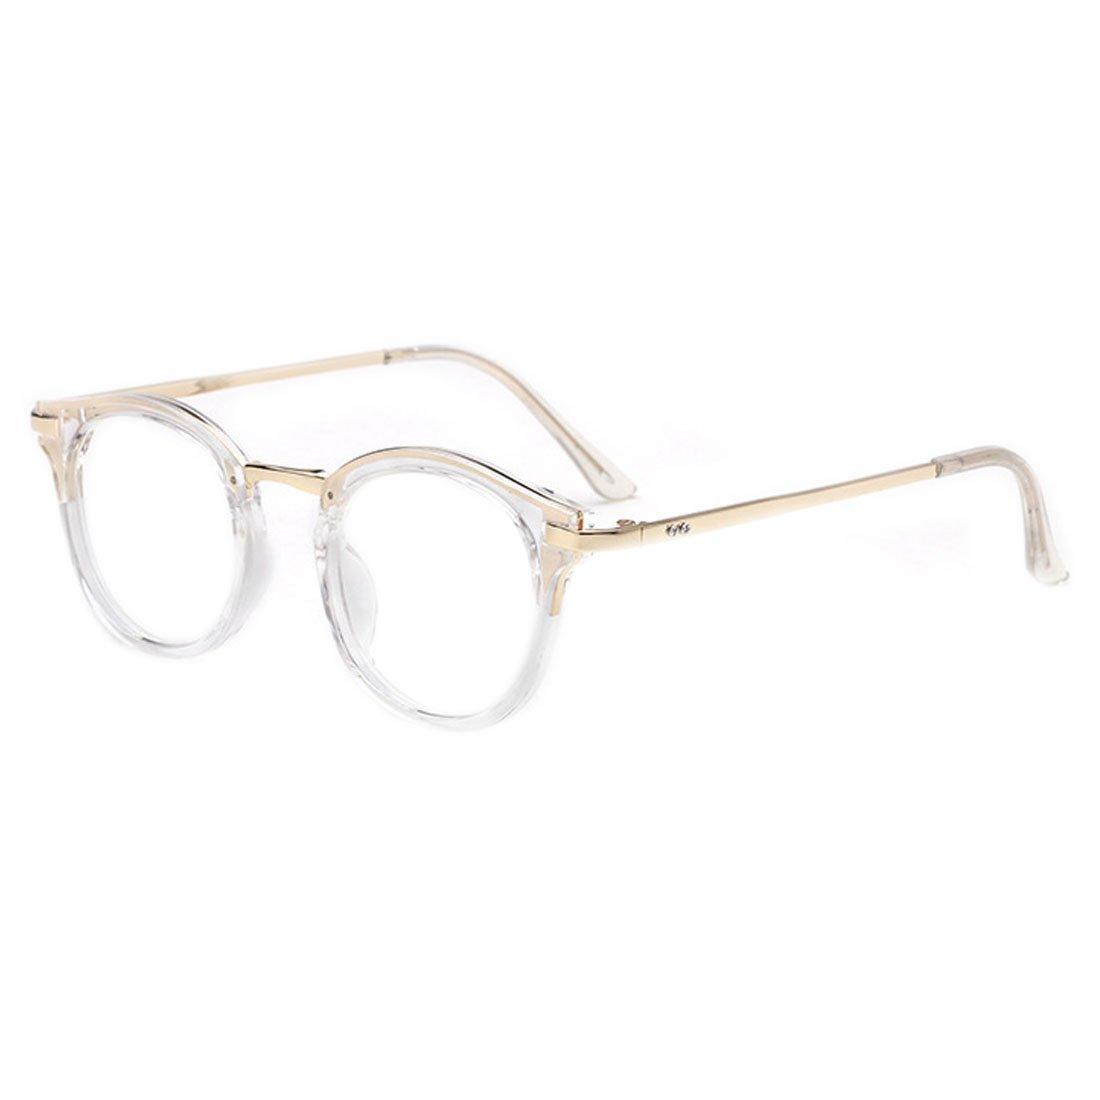 D.King Vintage Round Prescription Eyeglasses Horn Rim Clear Lens Eye Glasses Frame DK6101741-1